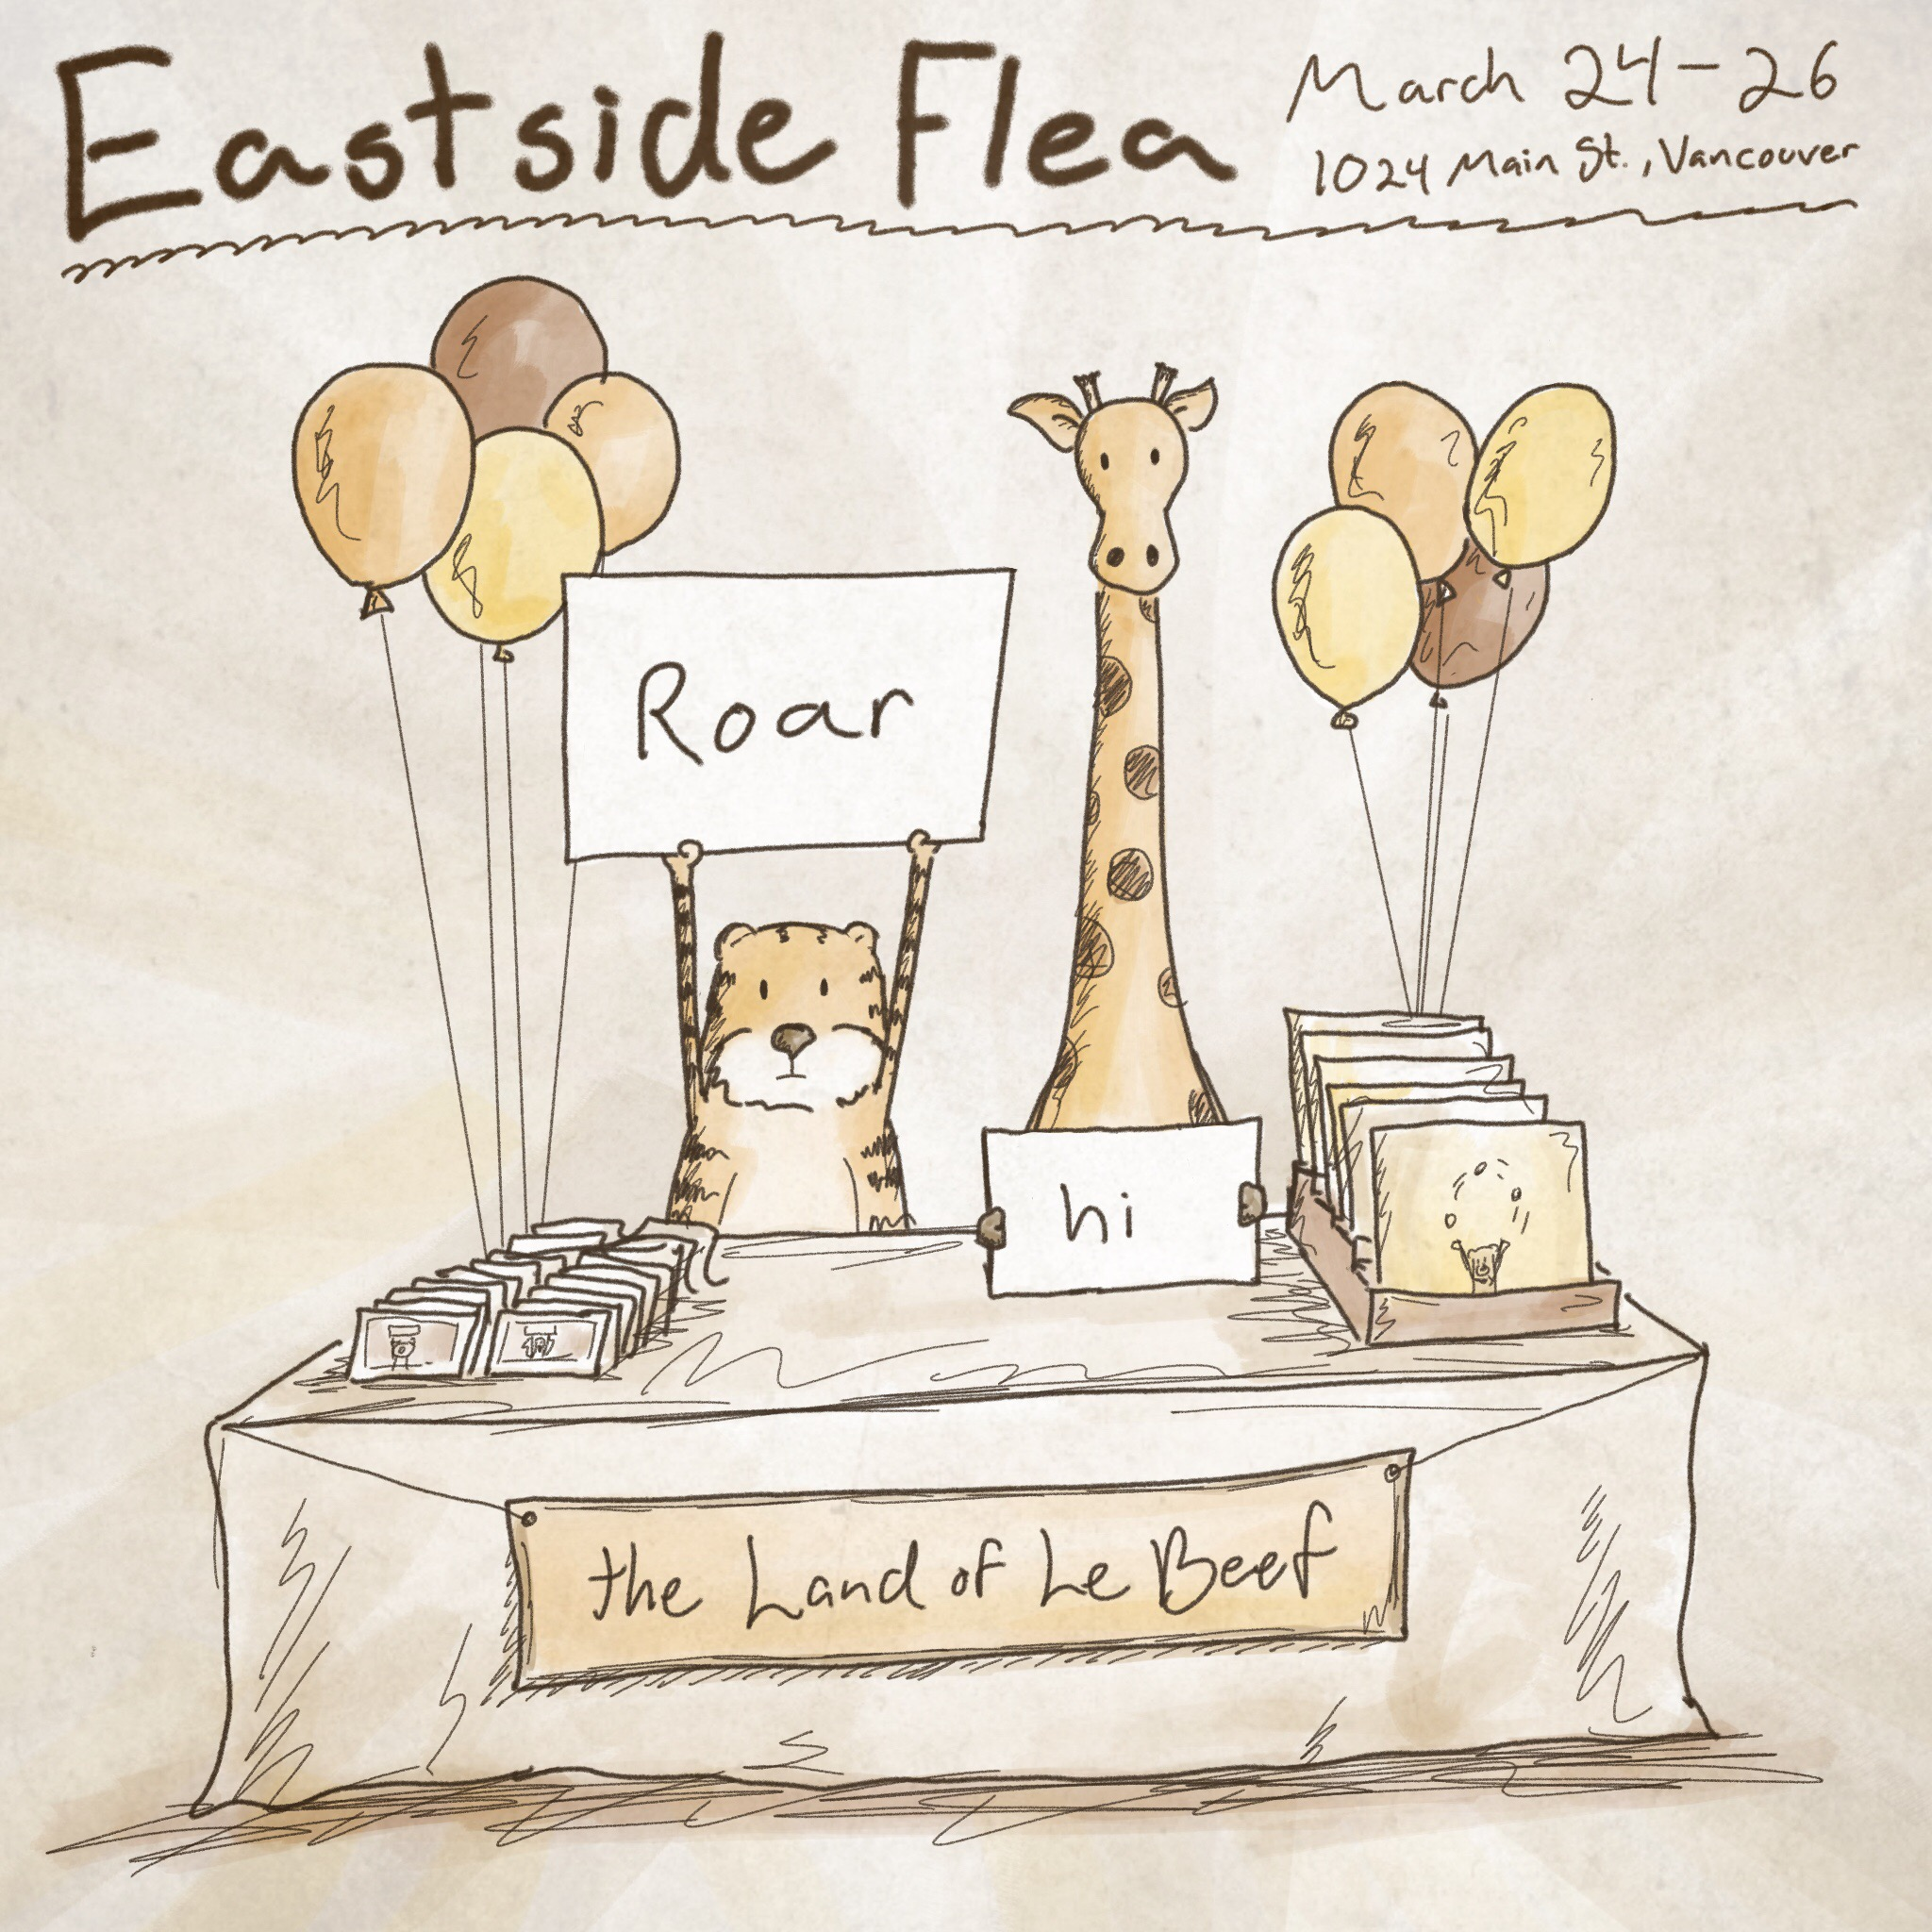 Eastside_Flea_2 (deleted 9716f497e2e3fb3bee4d5a2adf2ffe95).jpg